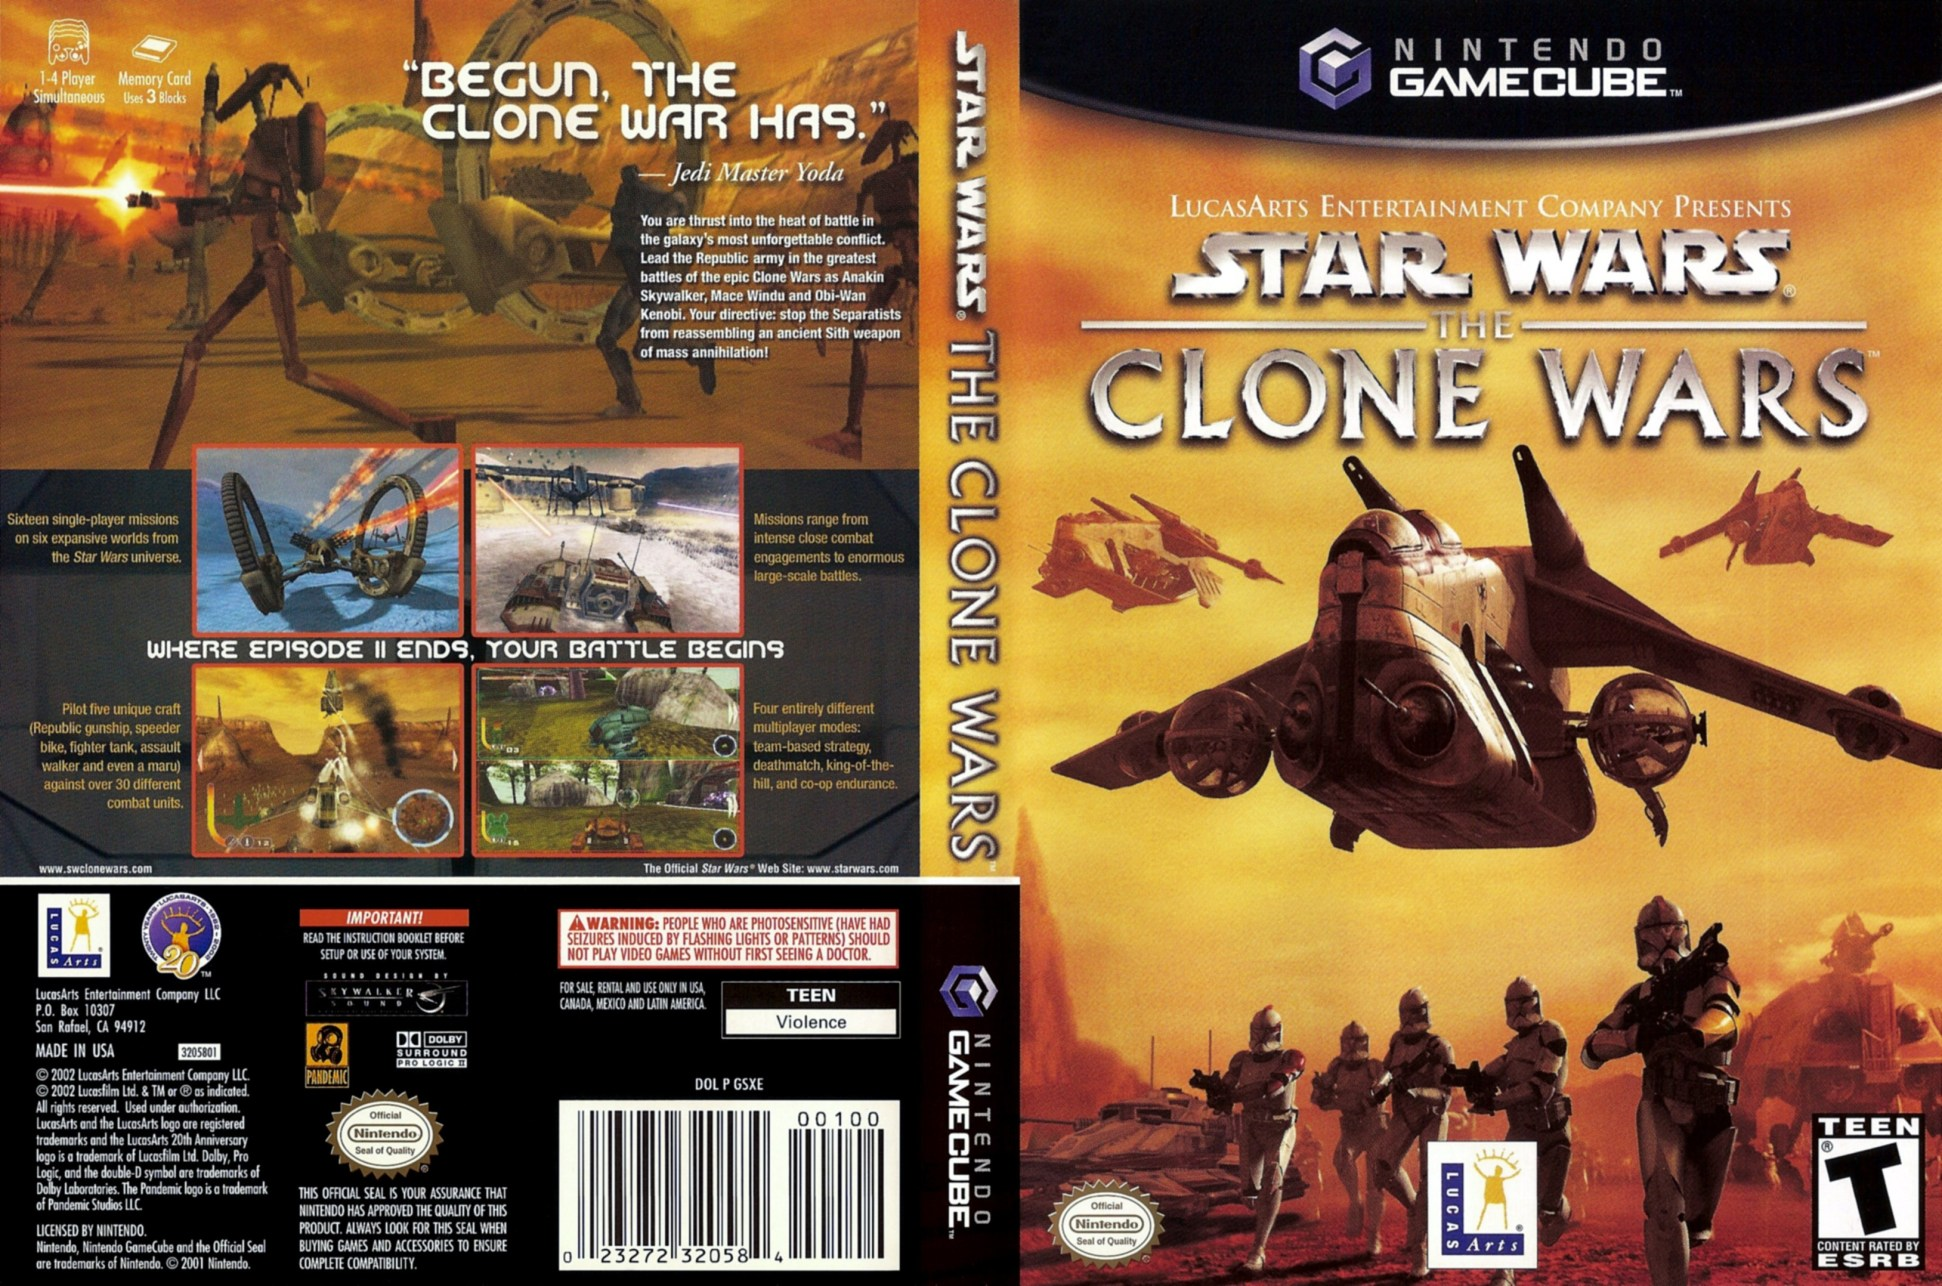 Download Star Wars The Clone Wars (Nintendo GameCube) Emu+Rom